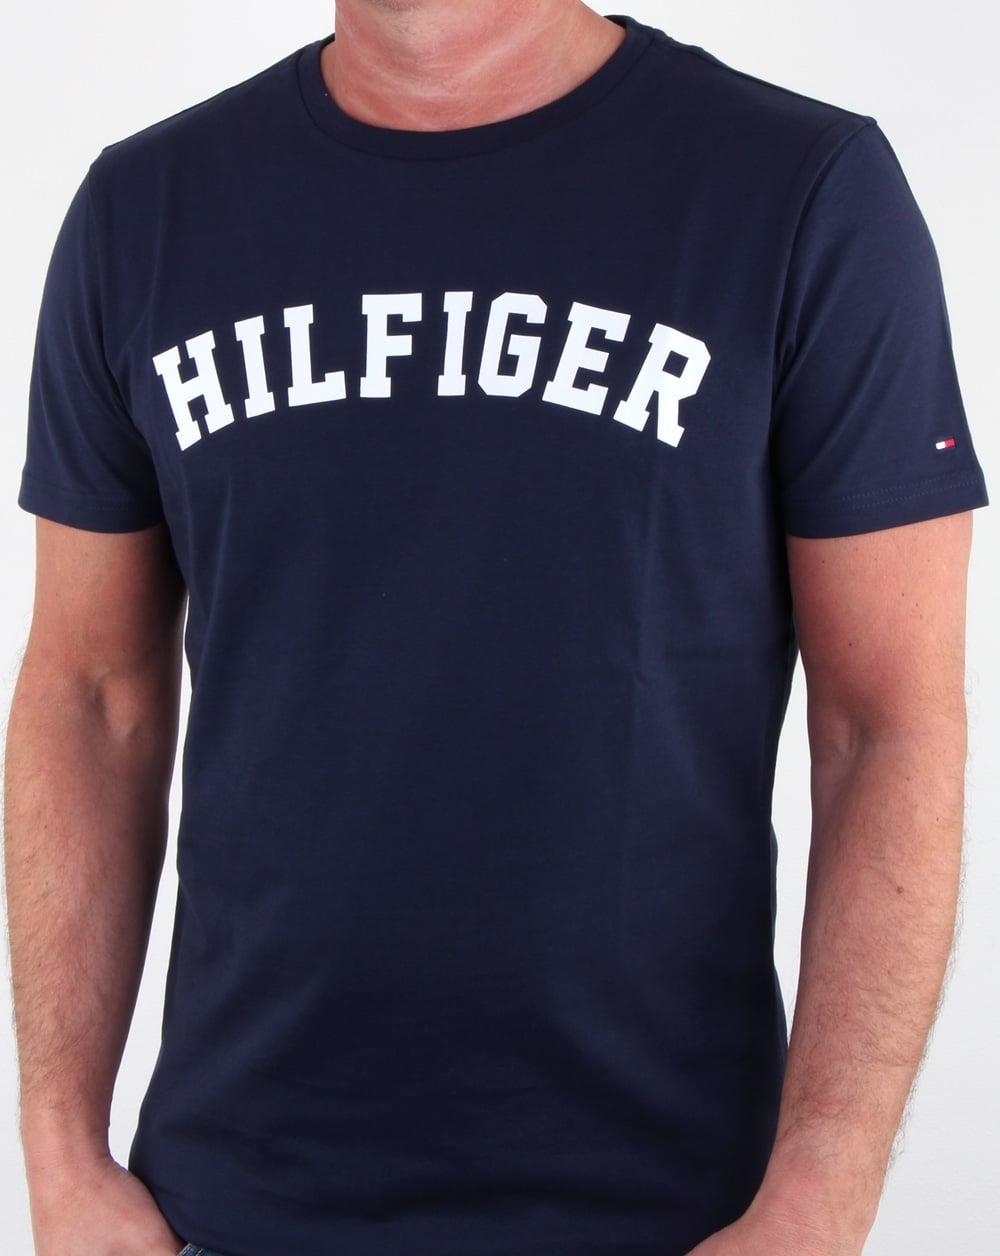 86a4639c Tommy Hilfiger Text Logo T Shirt Navy | 80s casual classics